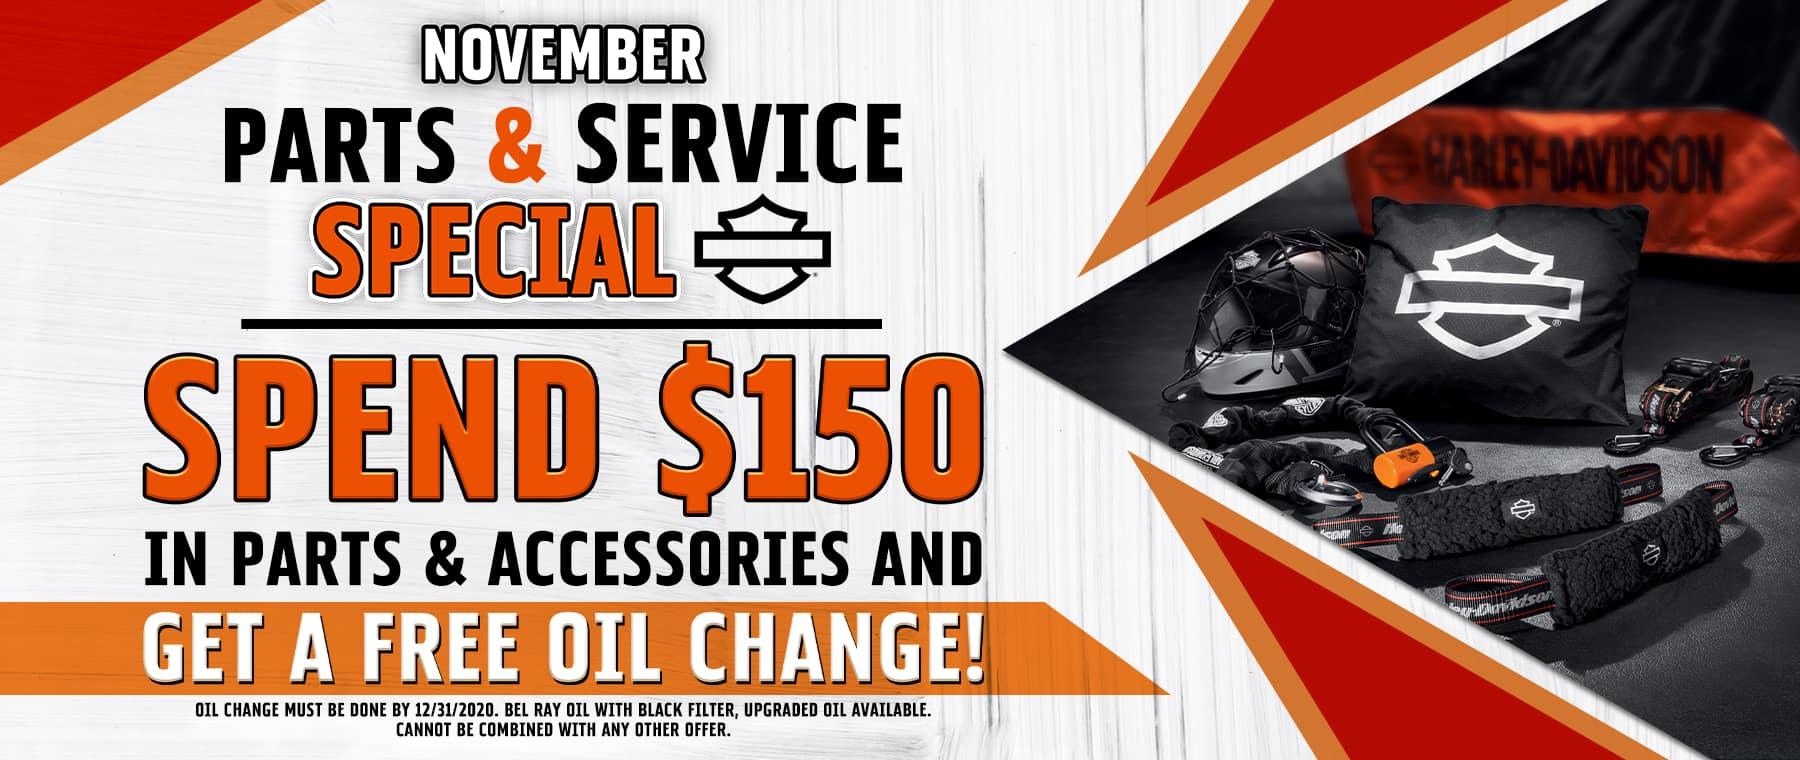 Parts & Service Special 2_ Slide